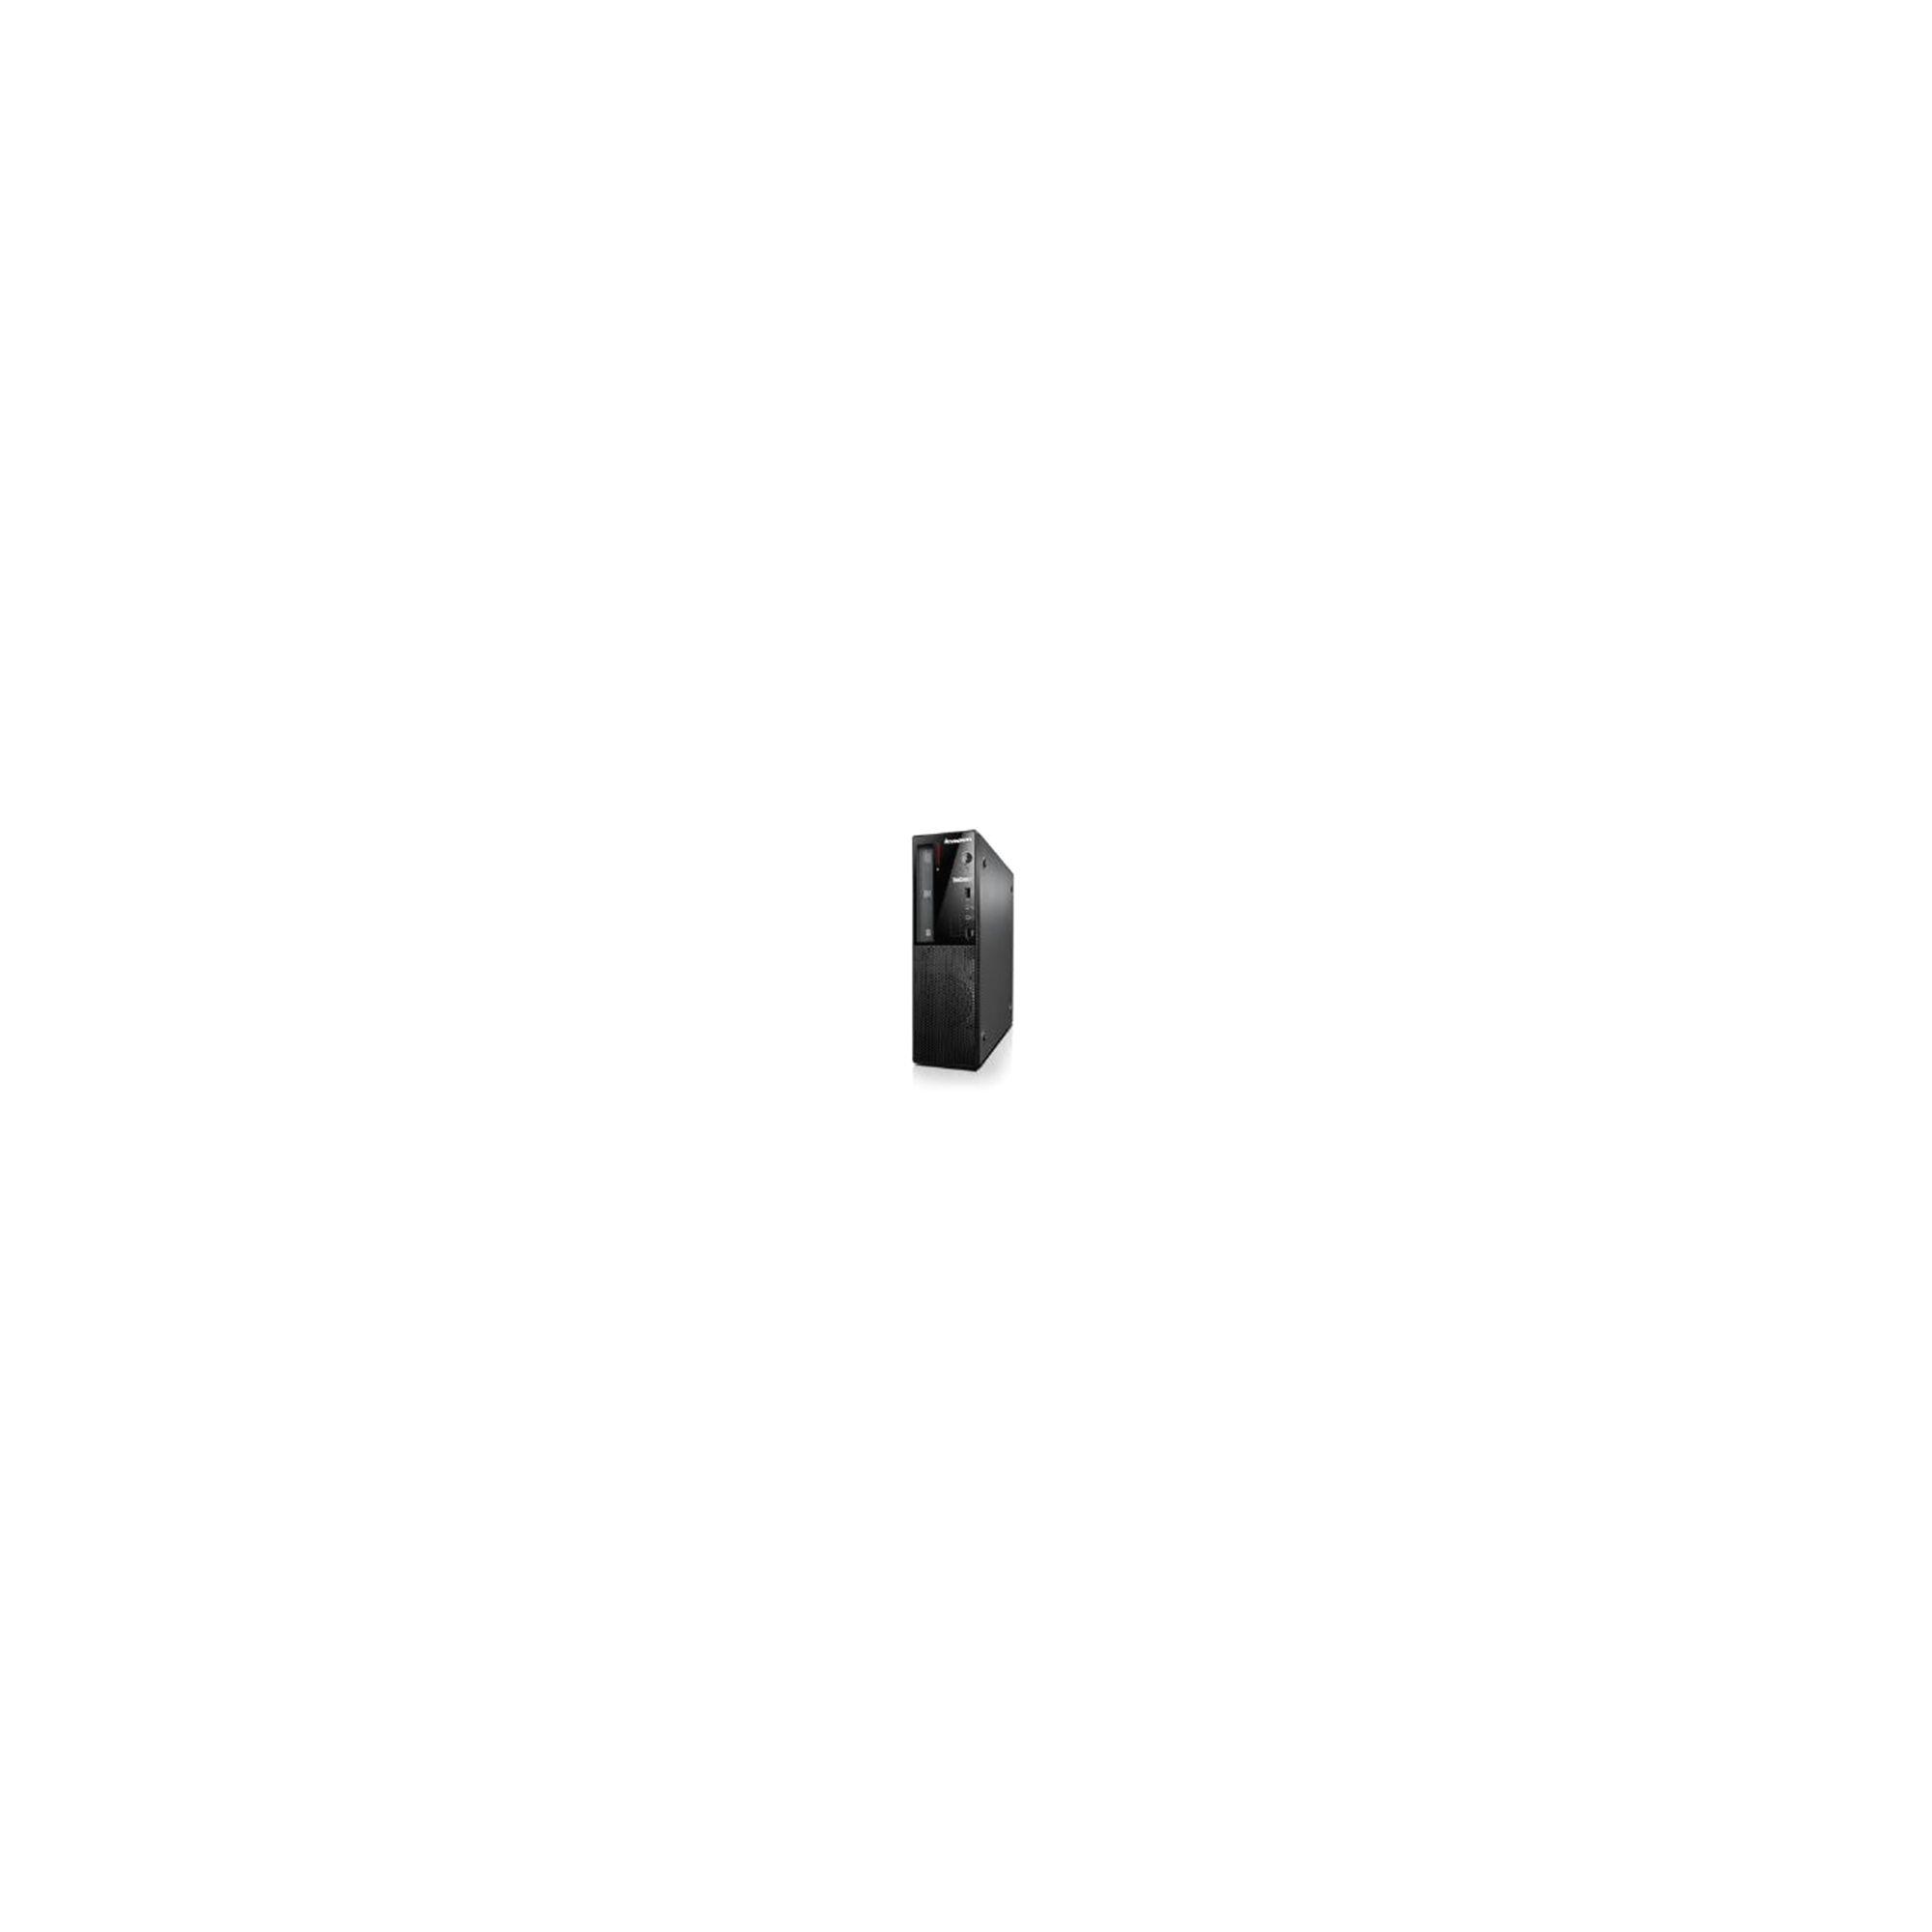 Lenovo ThinkCentre Edge 72 3493AZG Small Desktop PC Core i5 (3470S) 2.9GHz 4GB (1x4GB) 500GB DVD?RW LAN Windows 7 Pro 64-bit/Win 8 Pro RDVD (Intel